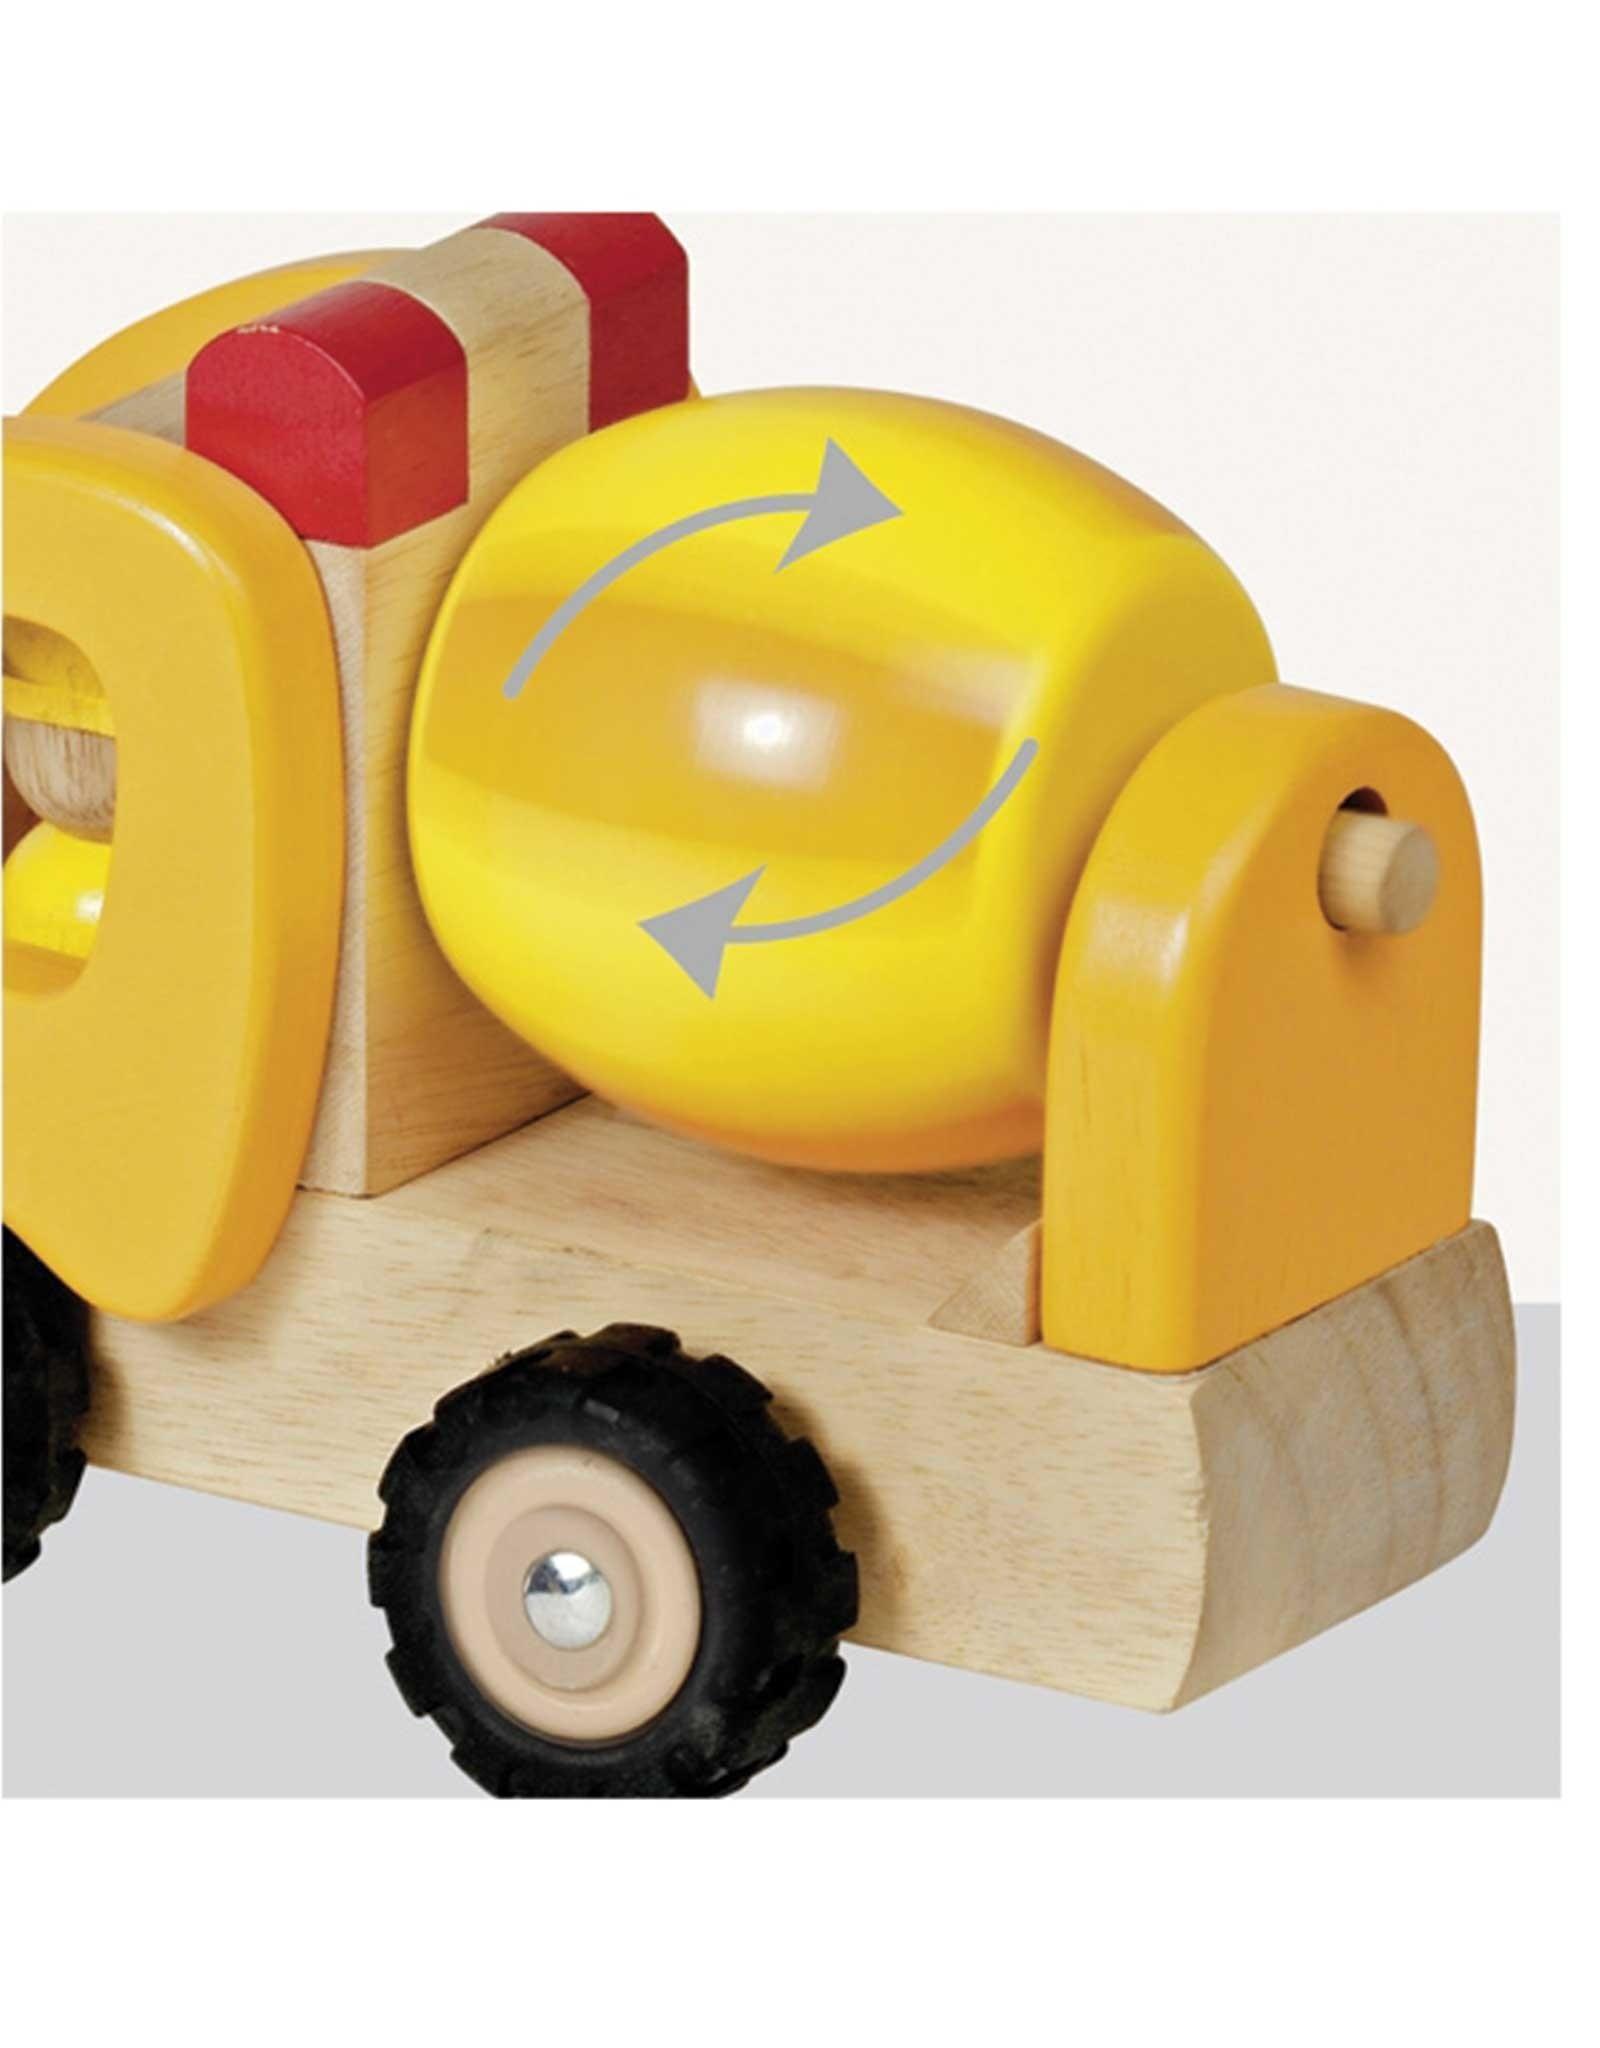 Goki Wooden Car - Cement Mixer